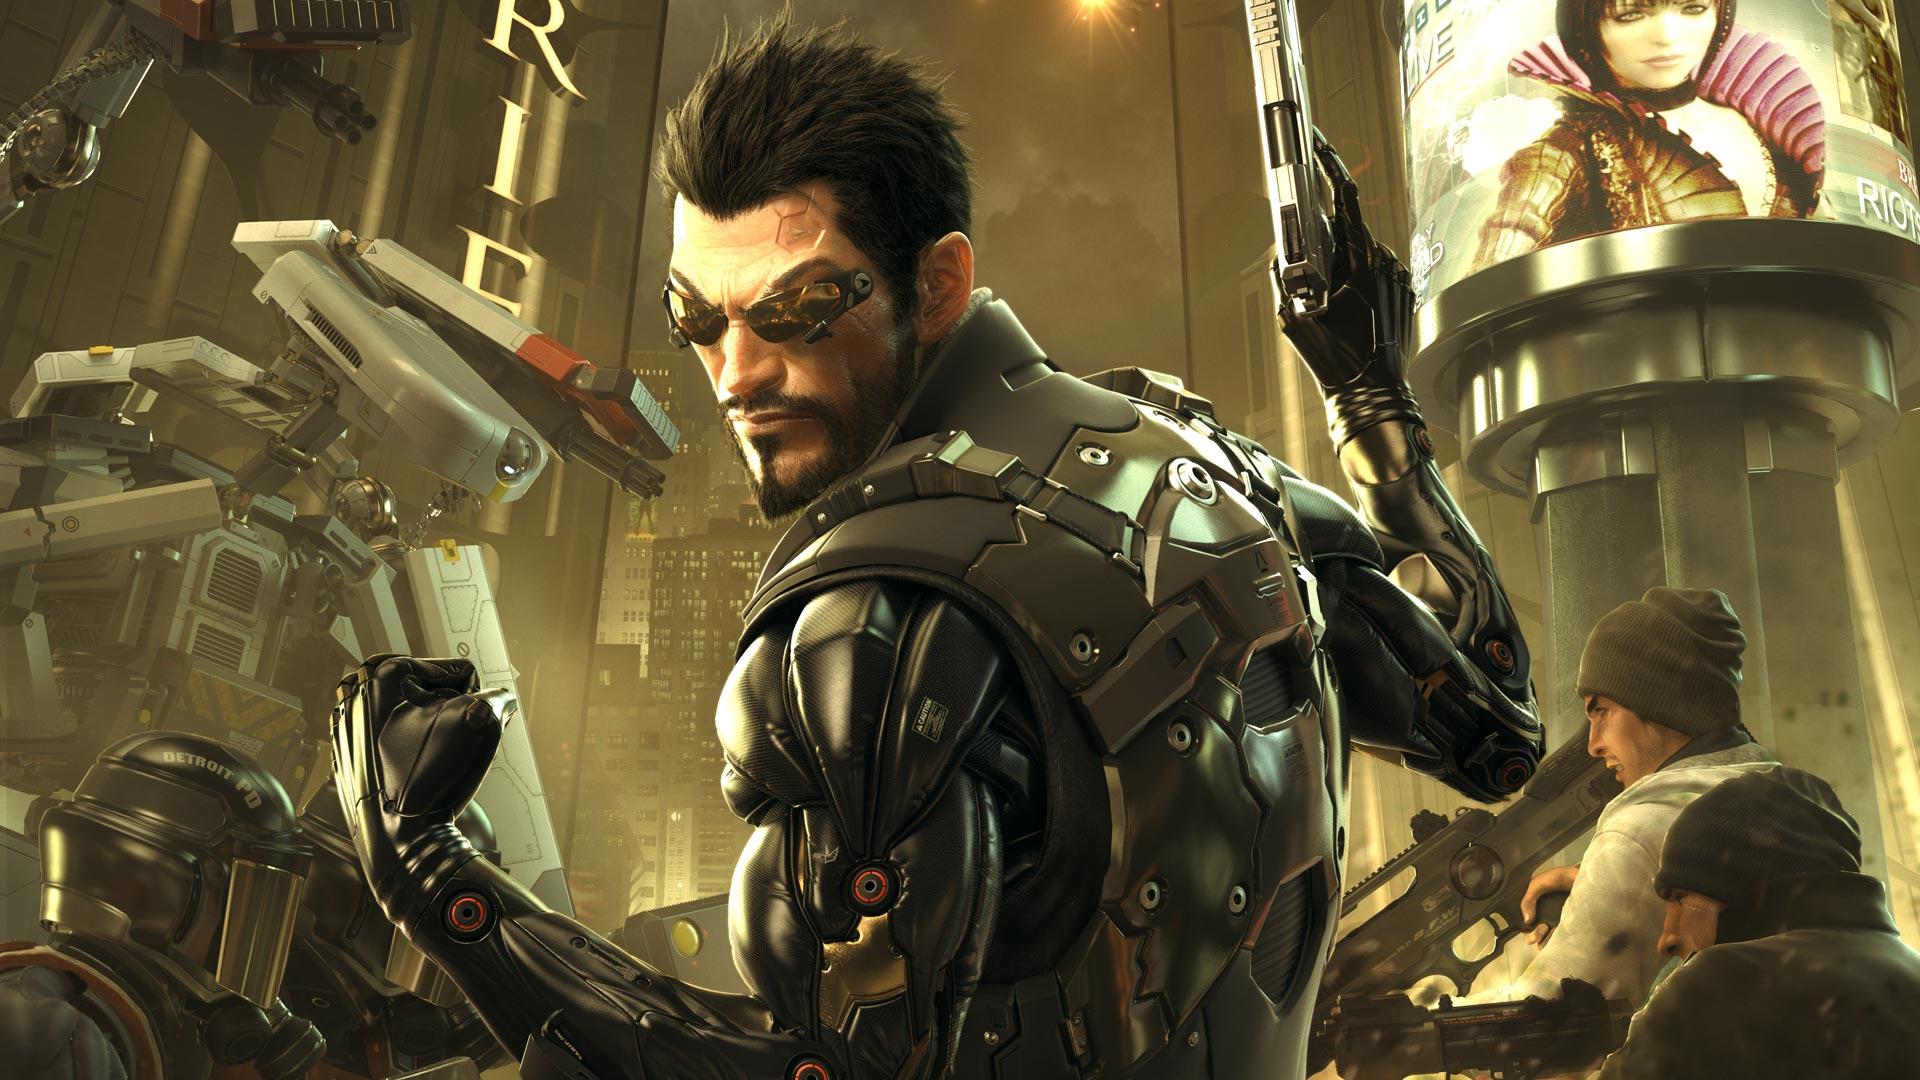 ca3e0f01c1a7c249071baaf08ac251c51e82ab90.jpg - Deus Ex: Human Revolution